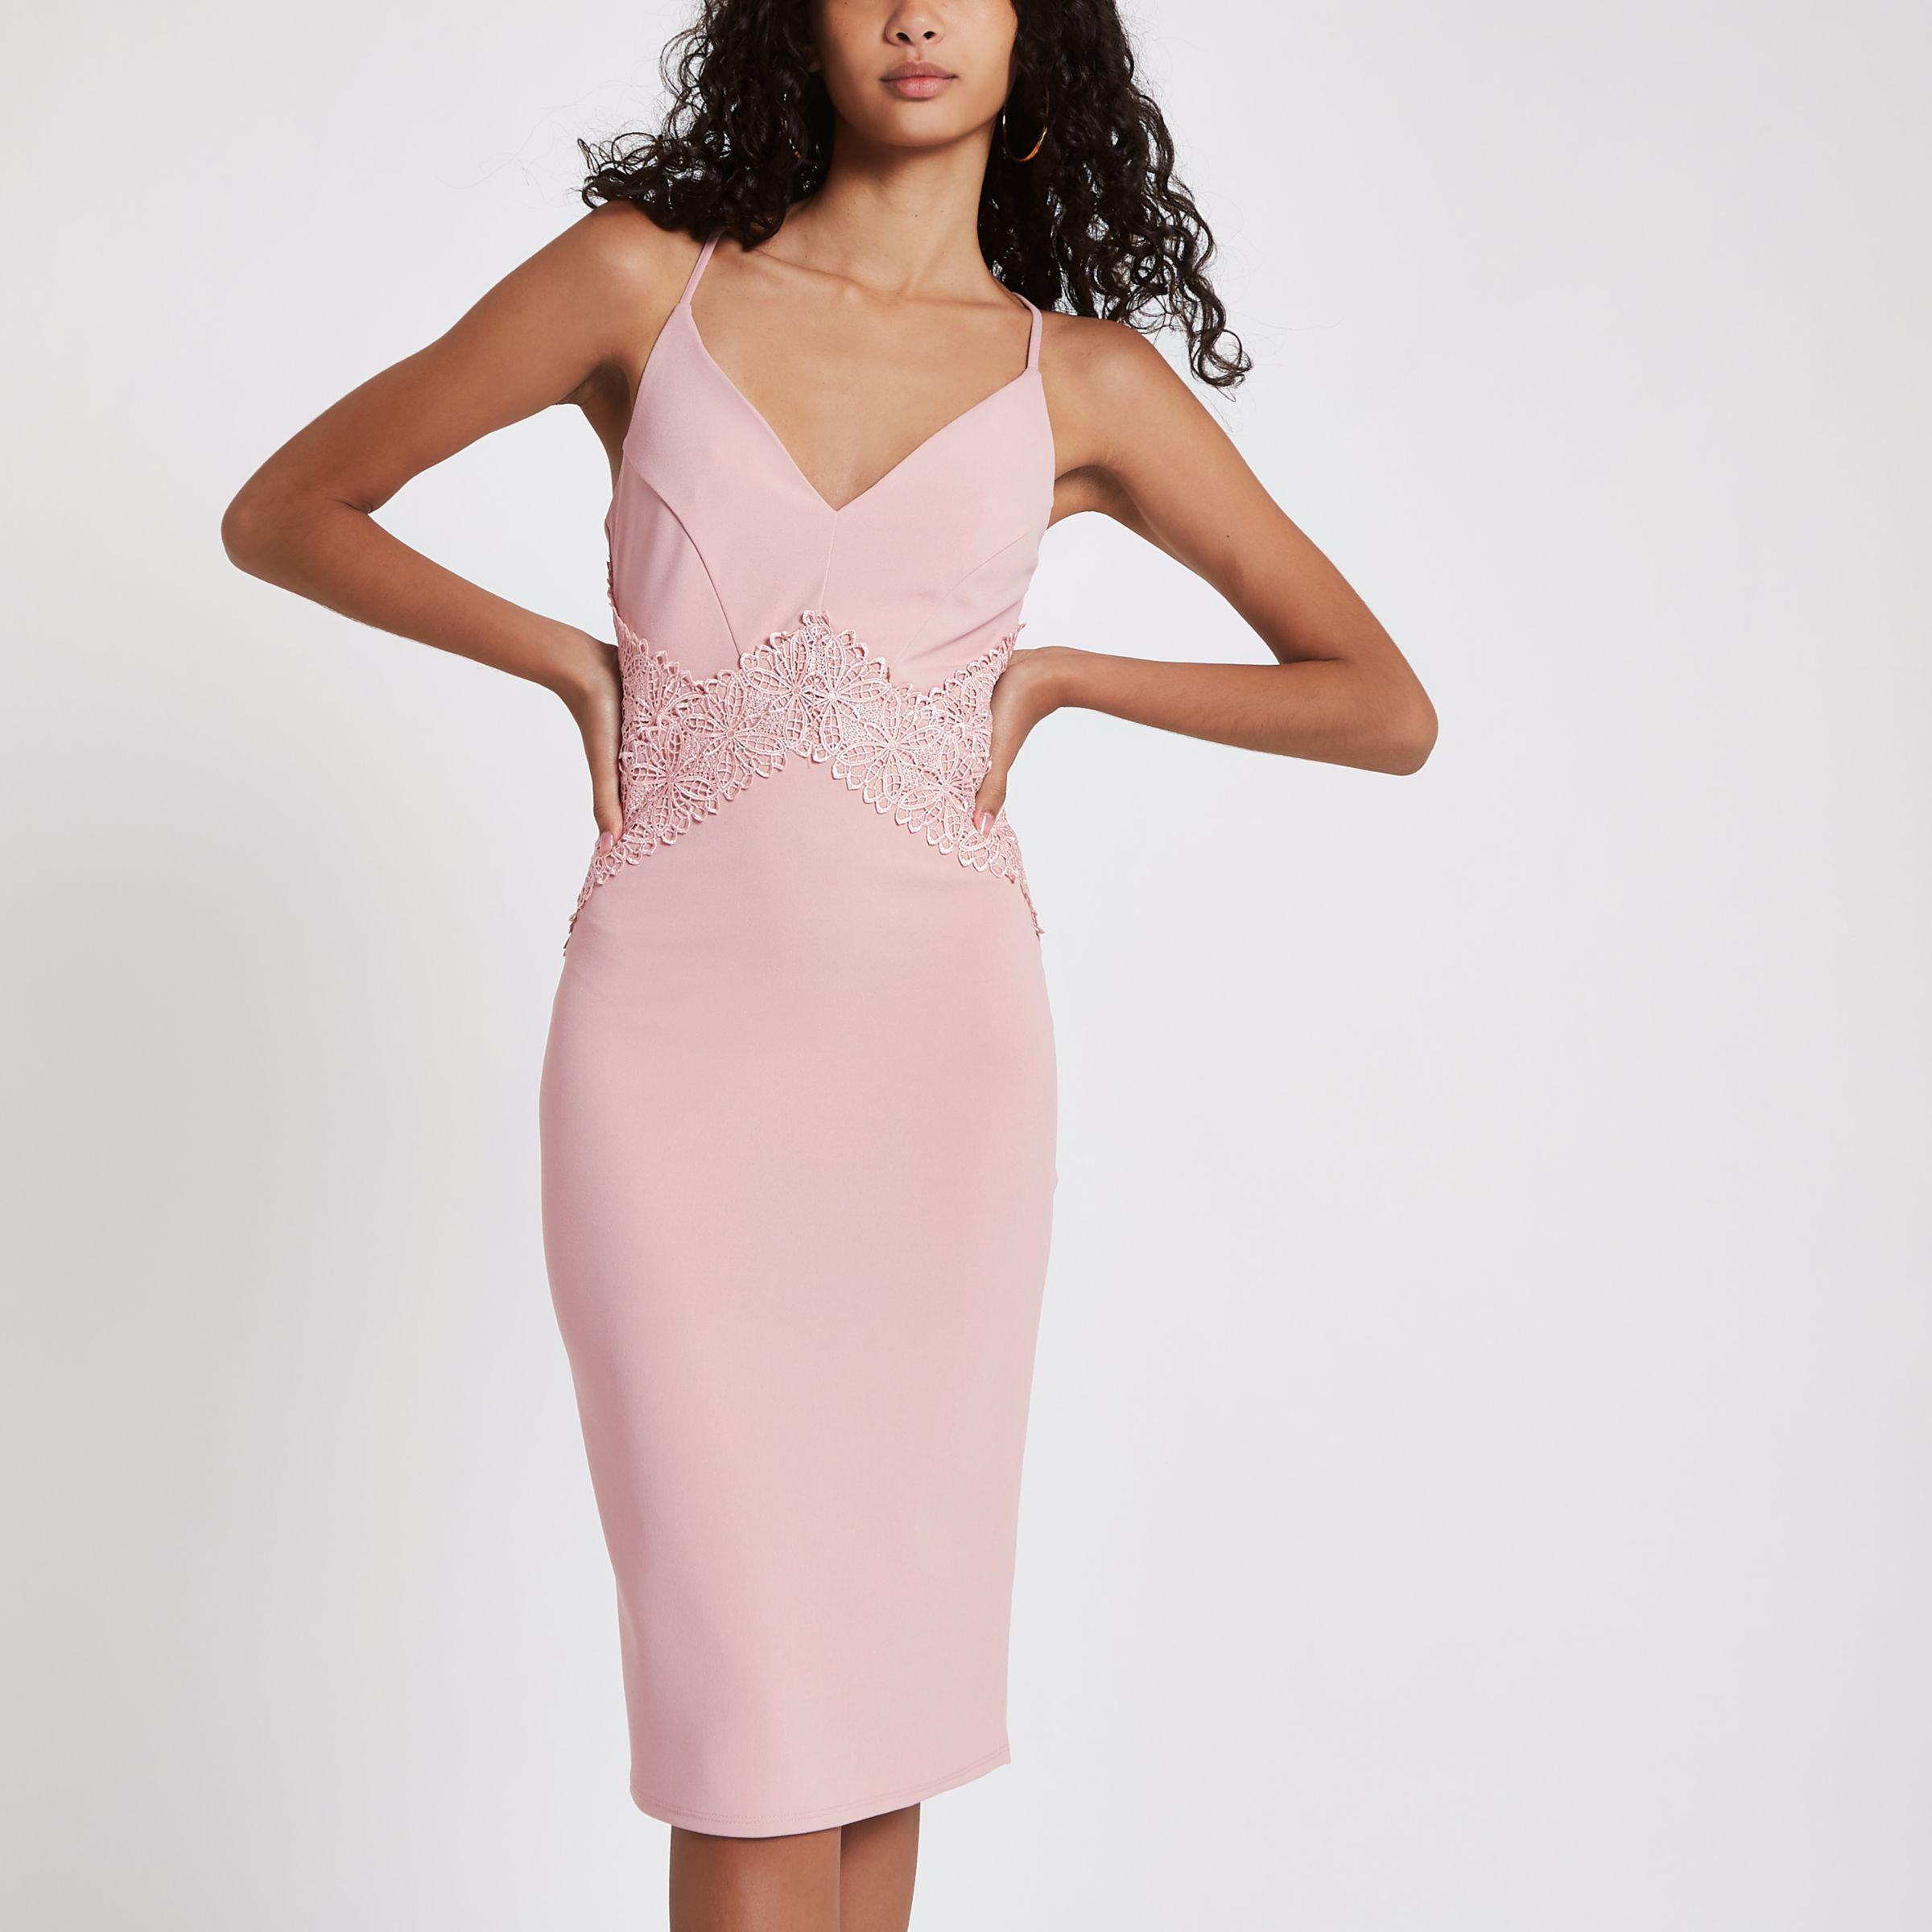 2ffdc2f392928 River Island Light Pink Lace Insert Bodycon Midi Dress in Pink - Lyst